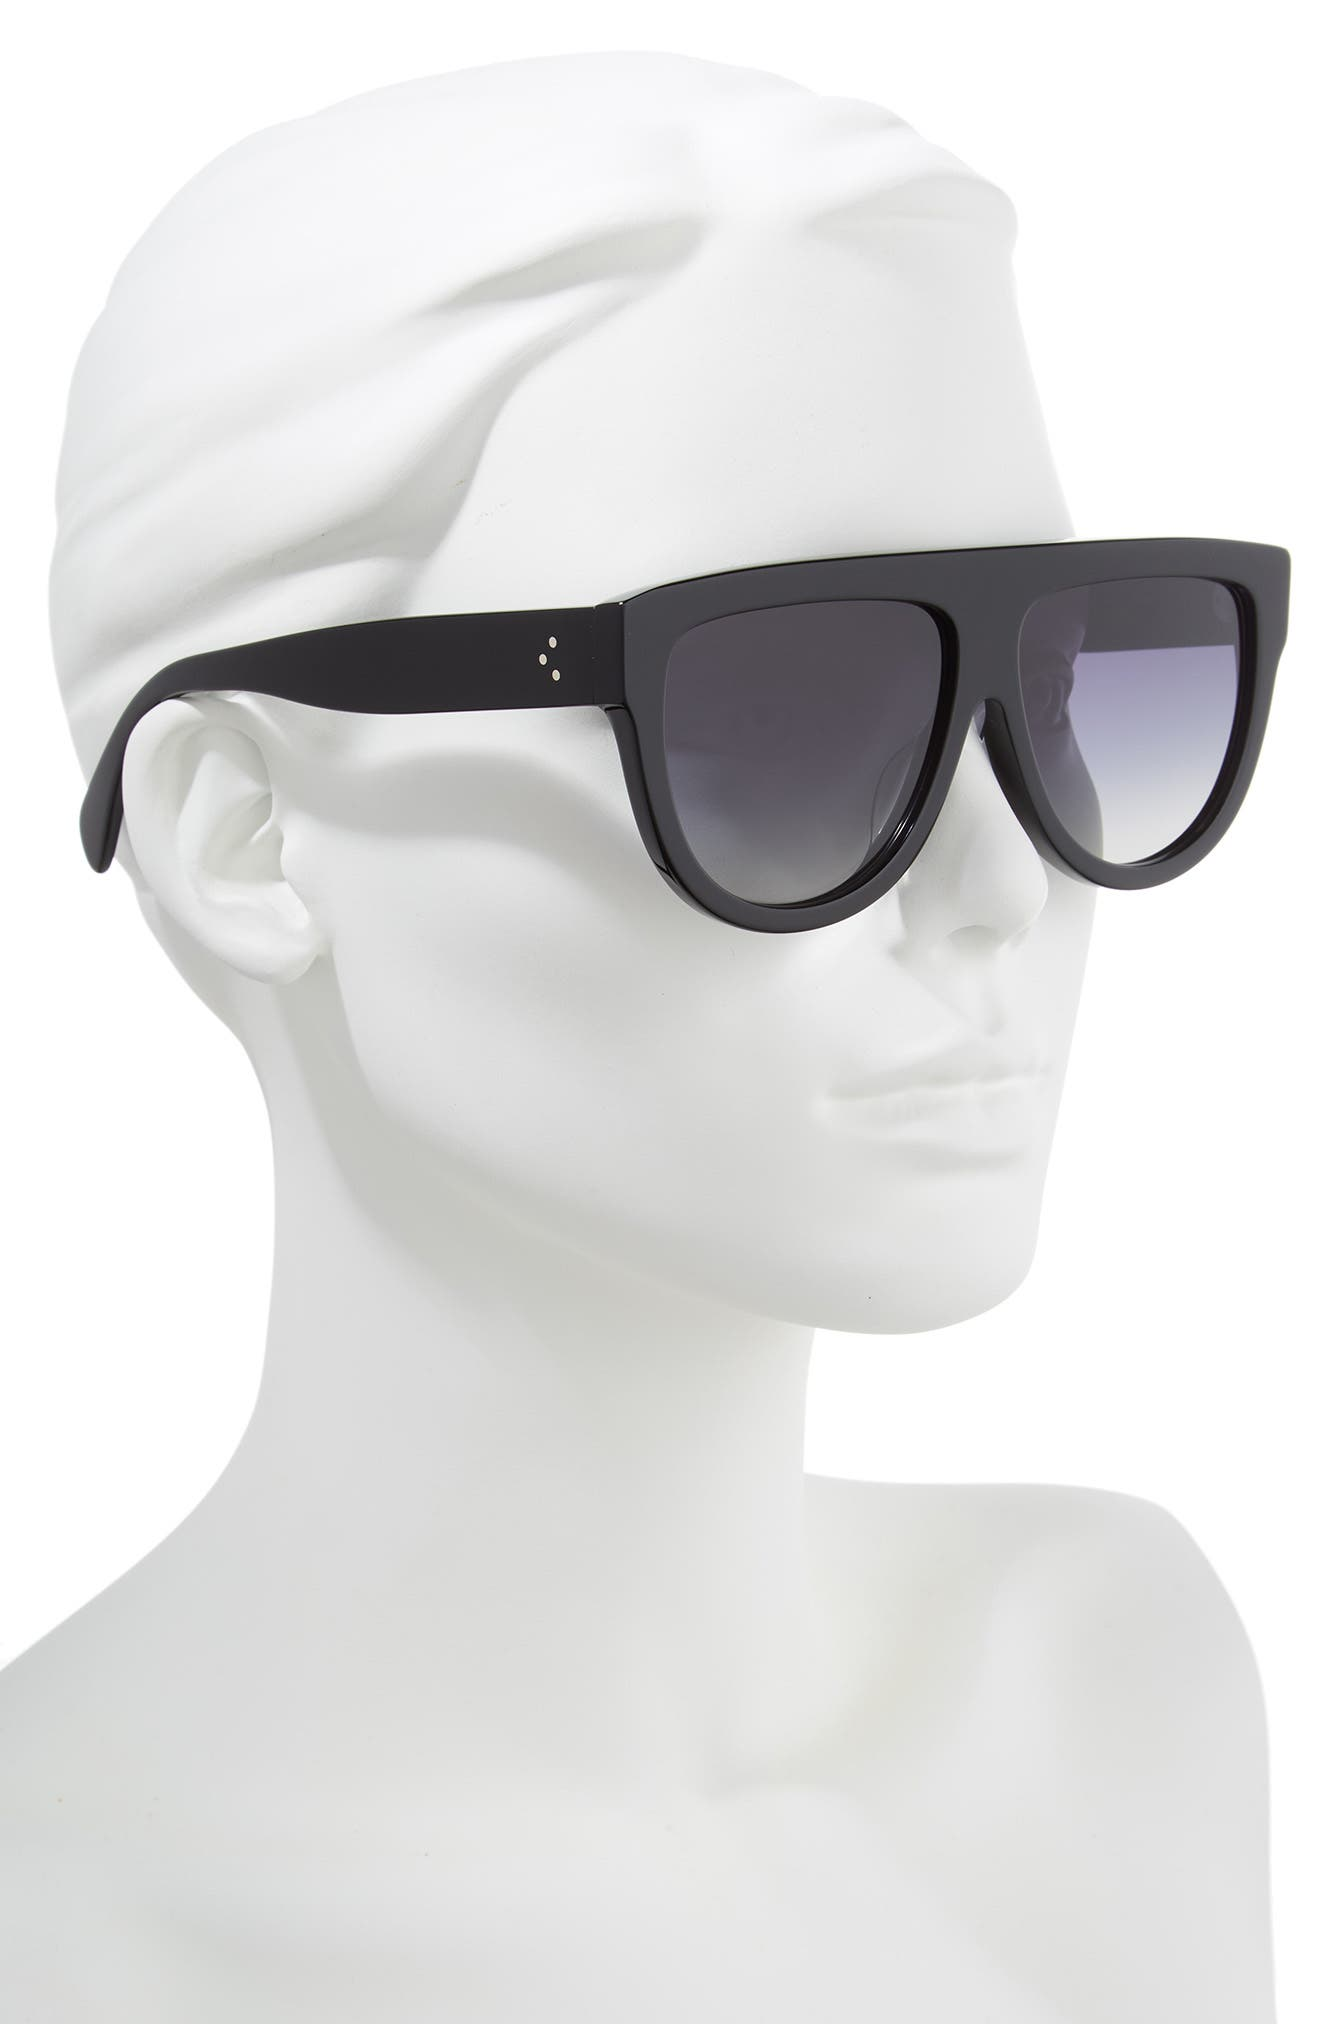 Special Fit 60mm Polarized Gradient Flat Top Sunglasses,                             Alternate thumbnail 3, color,                             BLACK/ GRADIENT SMOKE